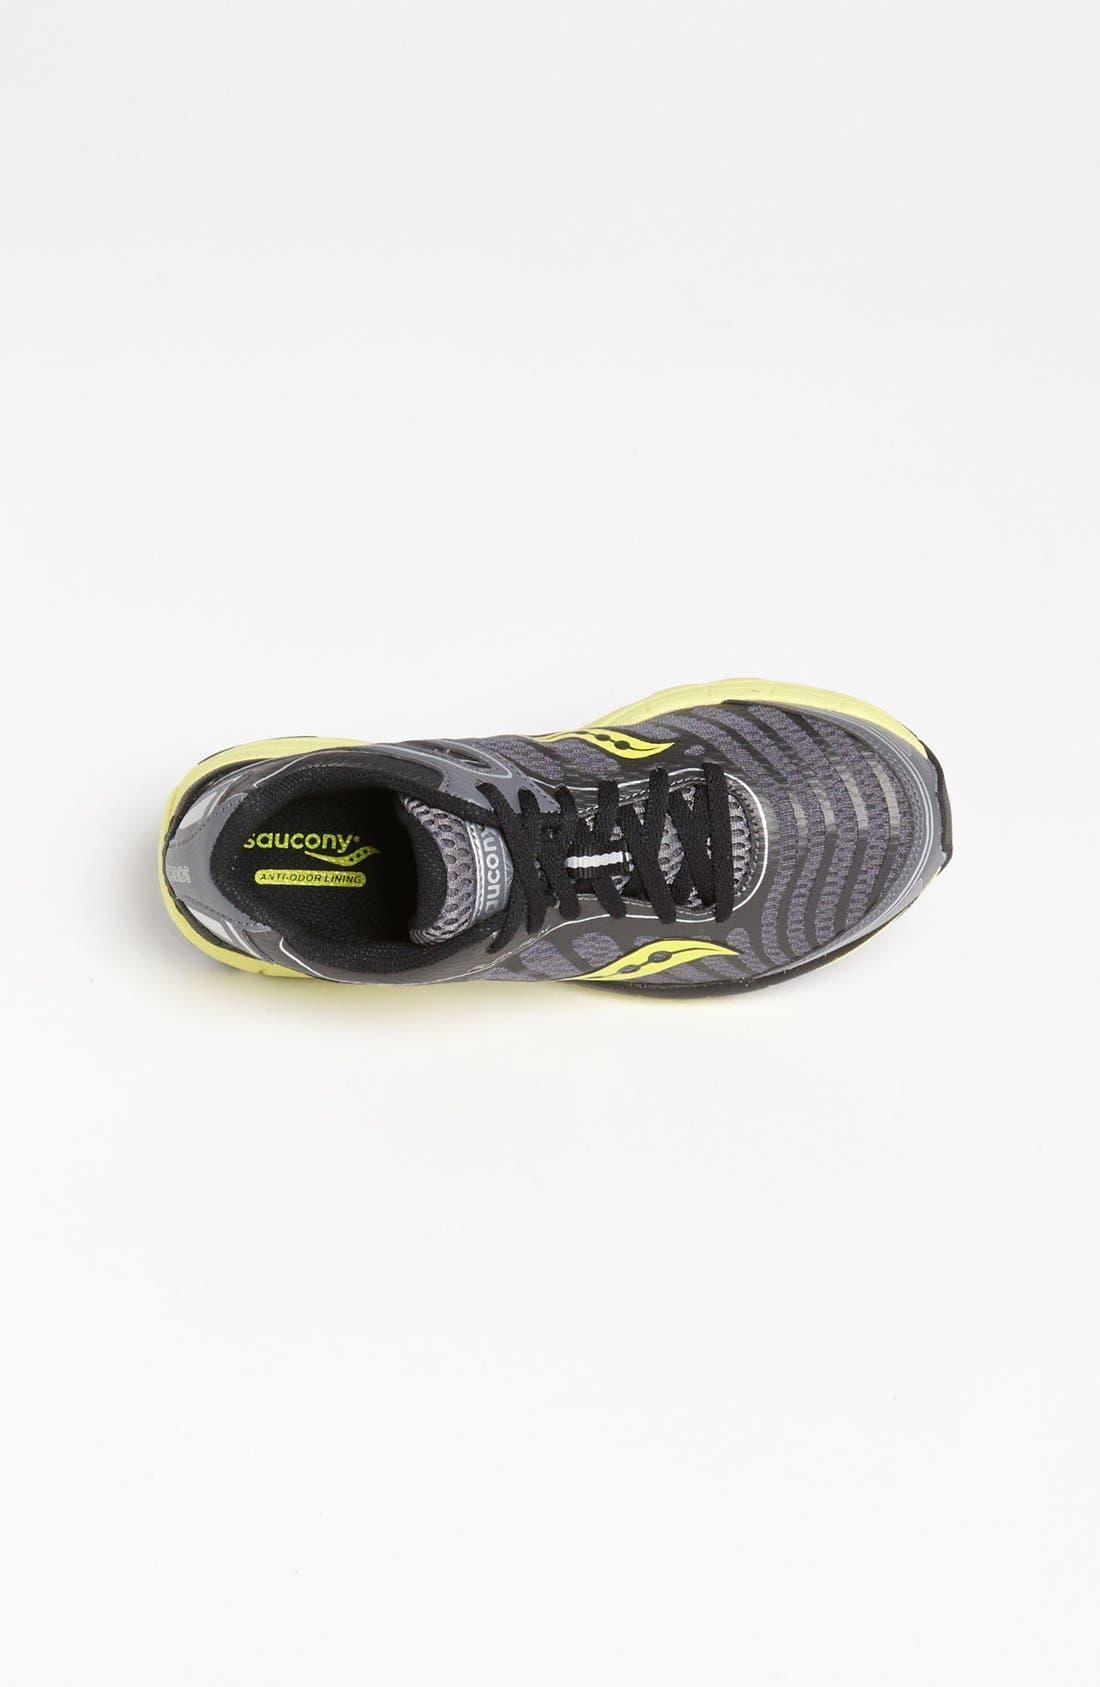 Alternate Image 3  - Saucony 'Kinvara' Athletic Shoe (Toddler, Little Kid & Big Kid)